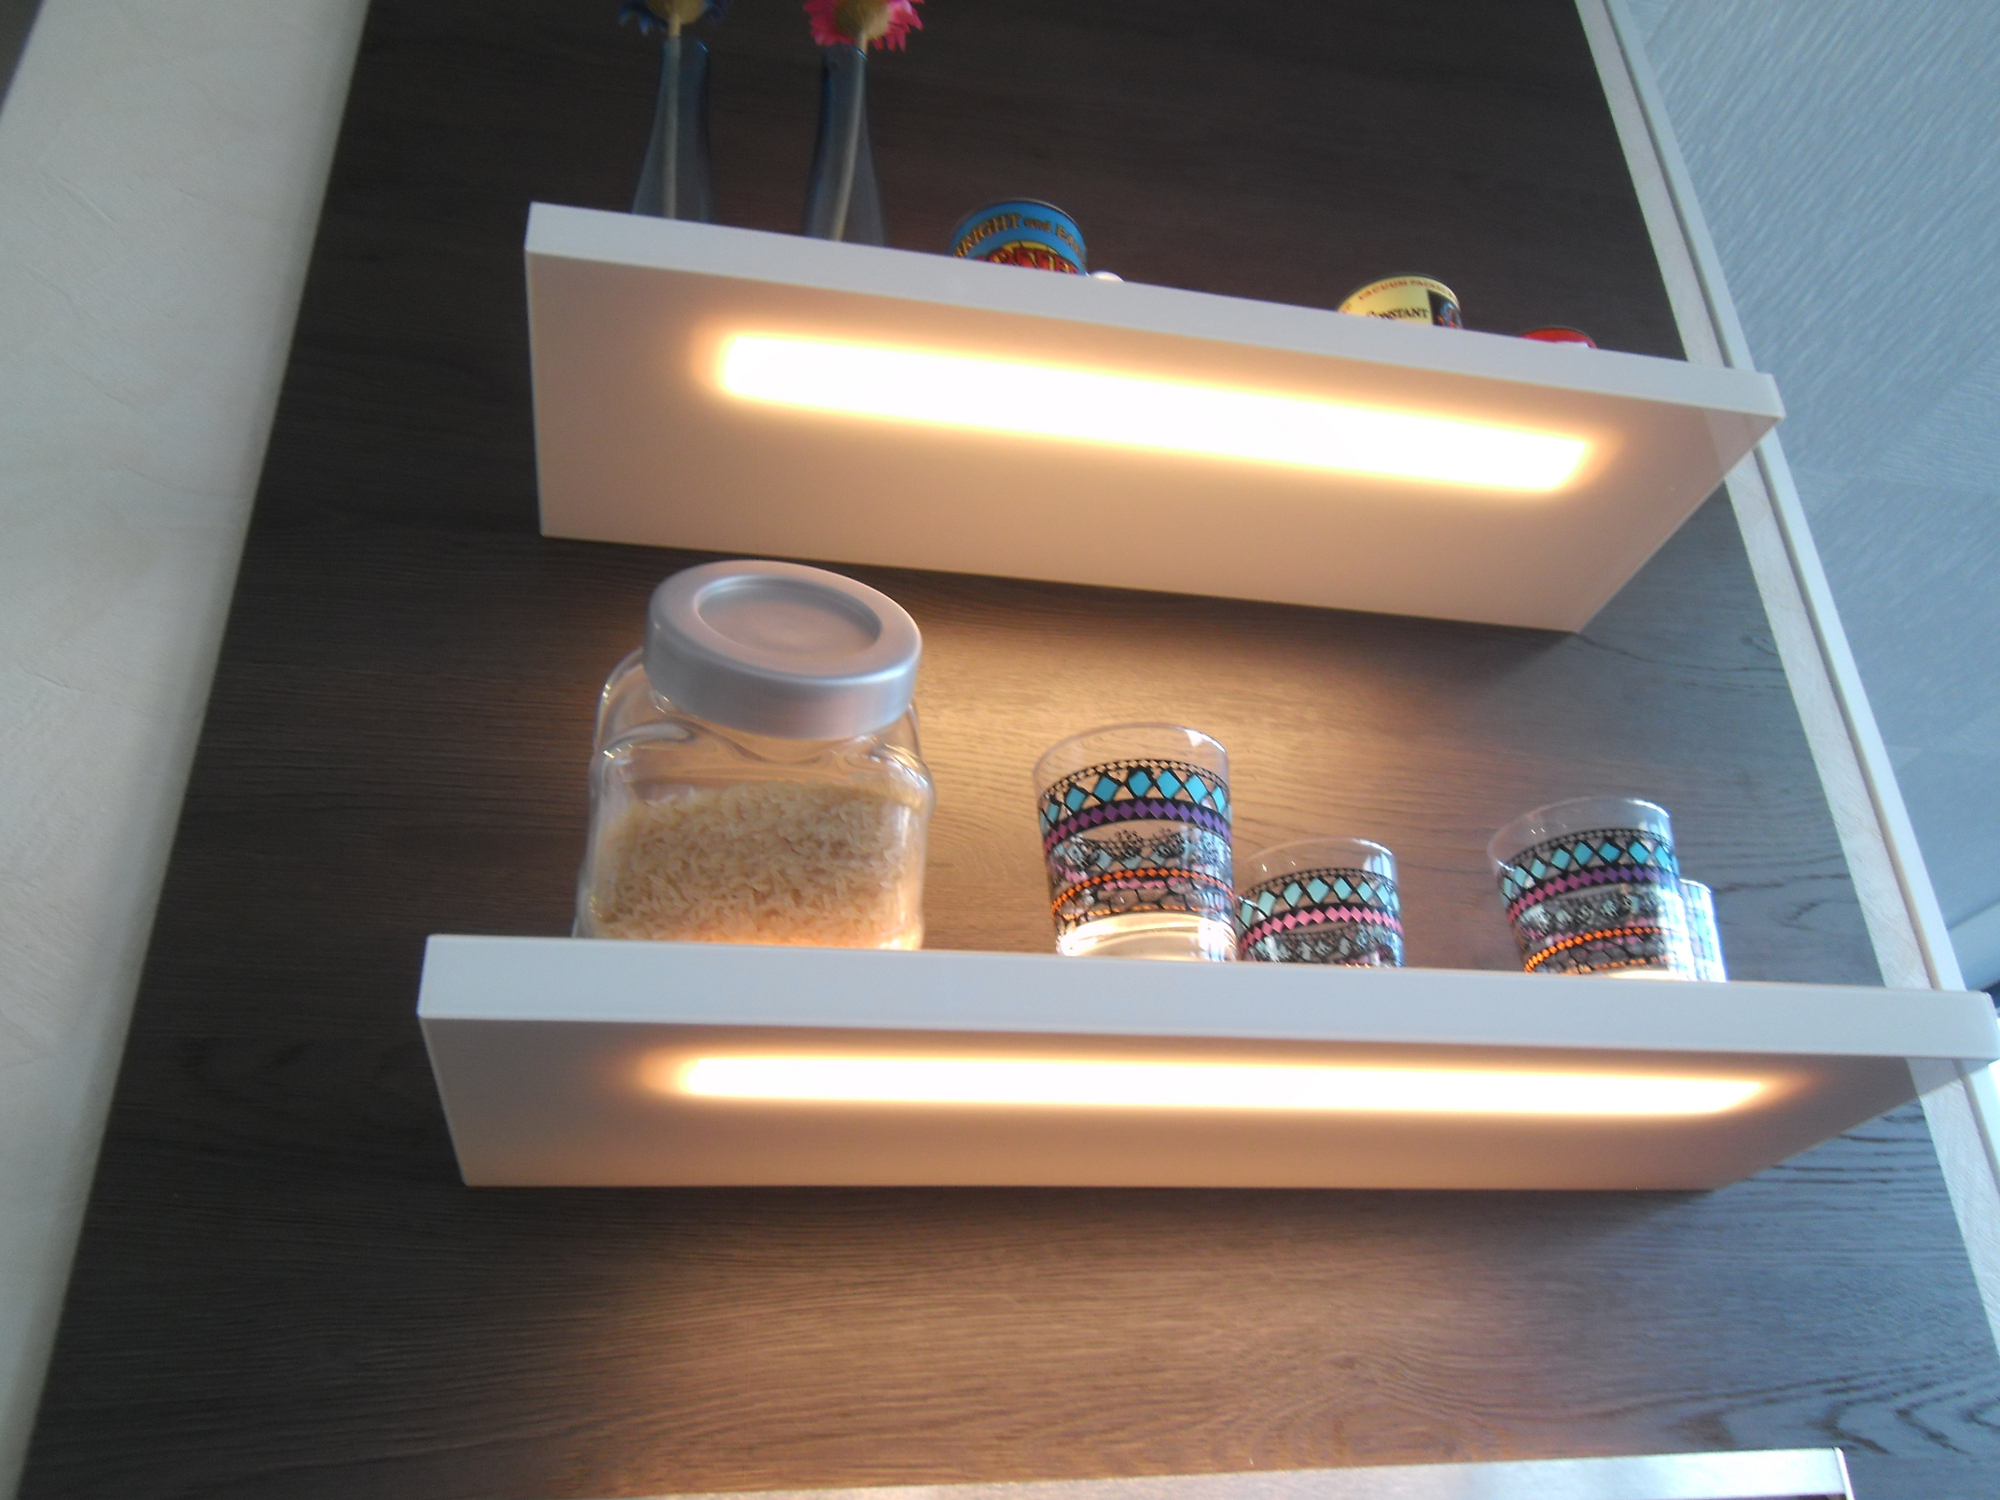 Wandborde mit LED-Beleuchtung